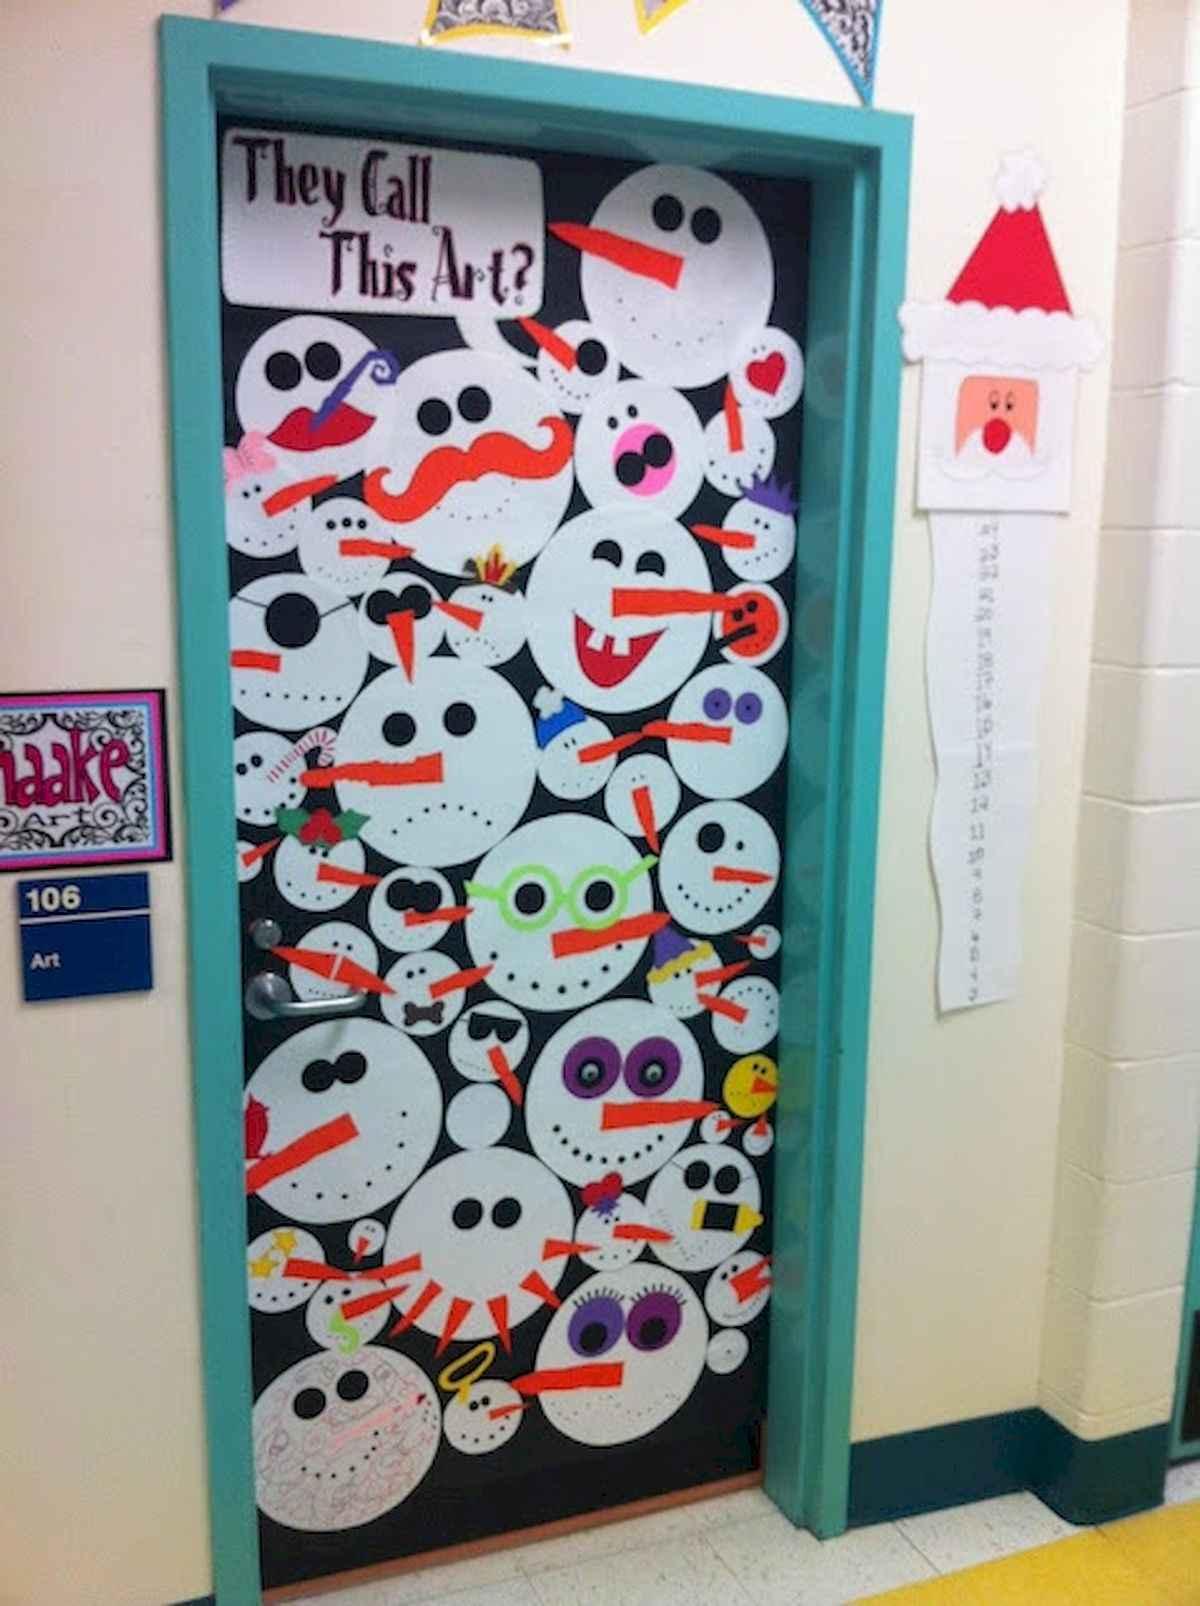 40 Creative DIY Christmas Door Decorations For Home And School (41) & 40 Creative DIY Christmas Door Decorations For Home And School ...